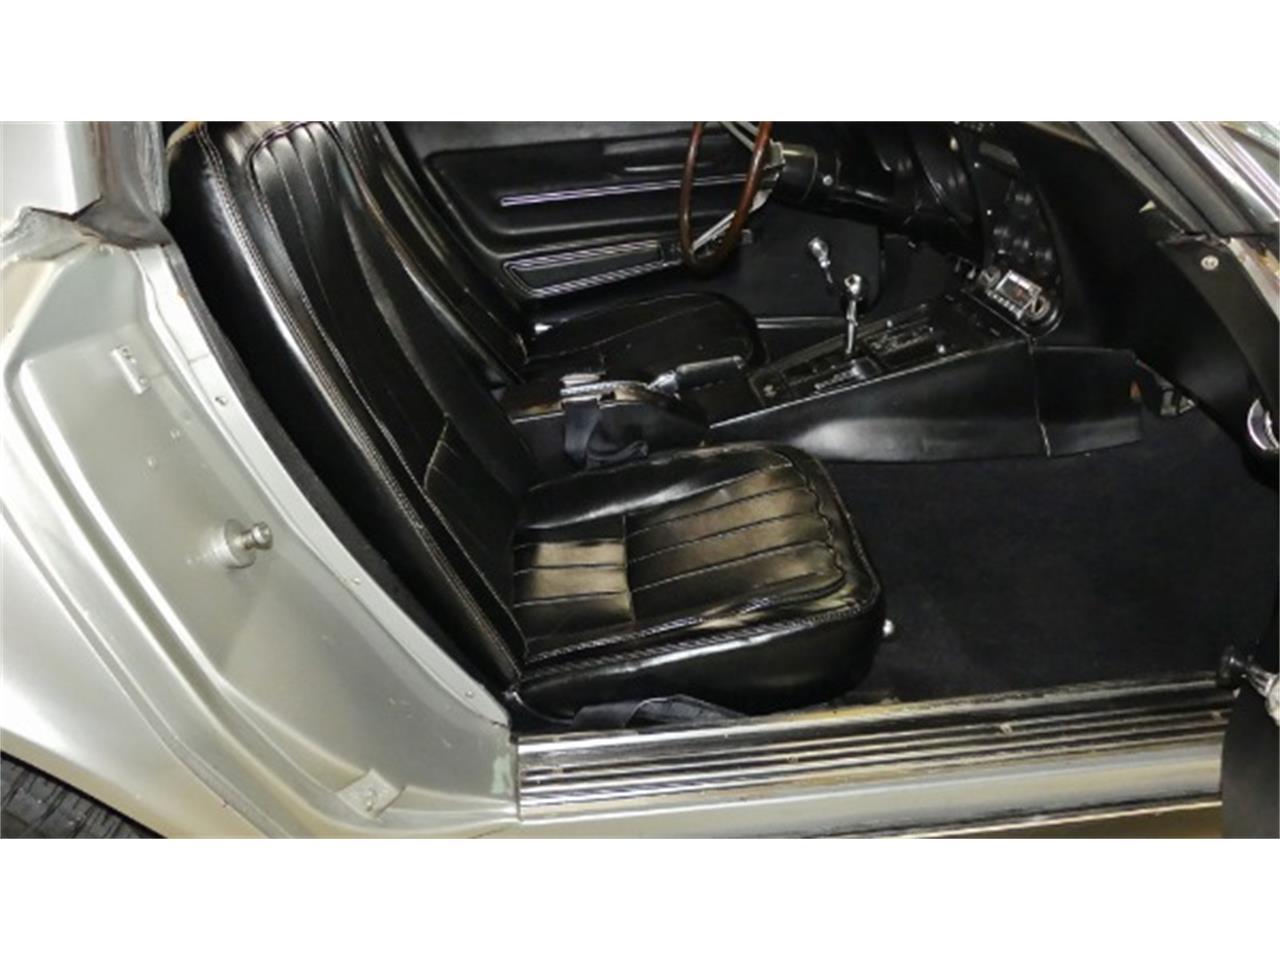 Large Picture of Classic '68 Chevrolet Corvette located in Columbus Ohio - $56,995.00 Offered by Cruisin Classics - Q47R